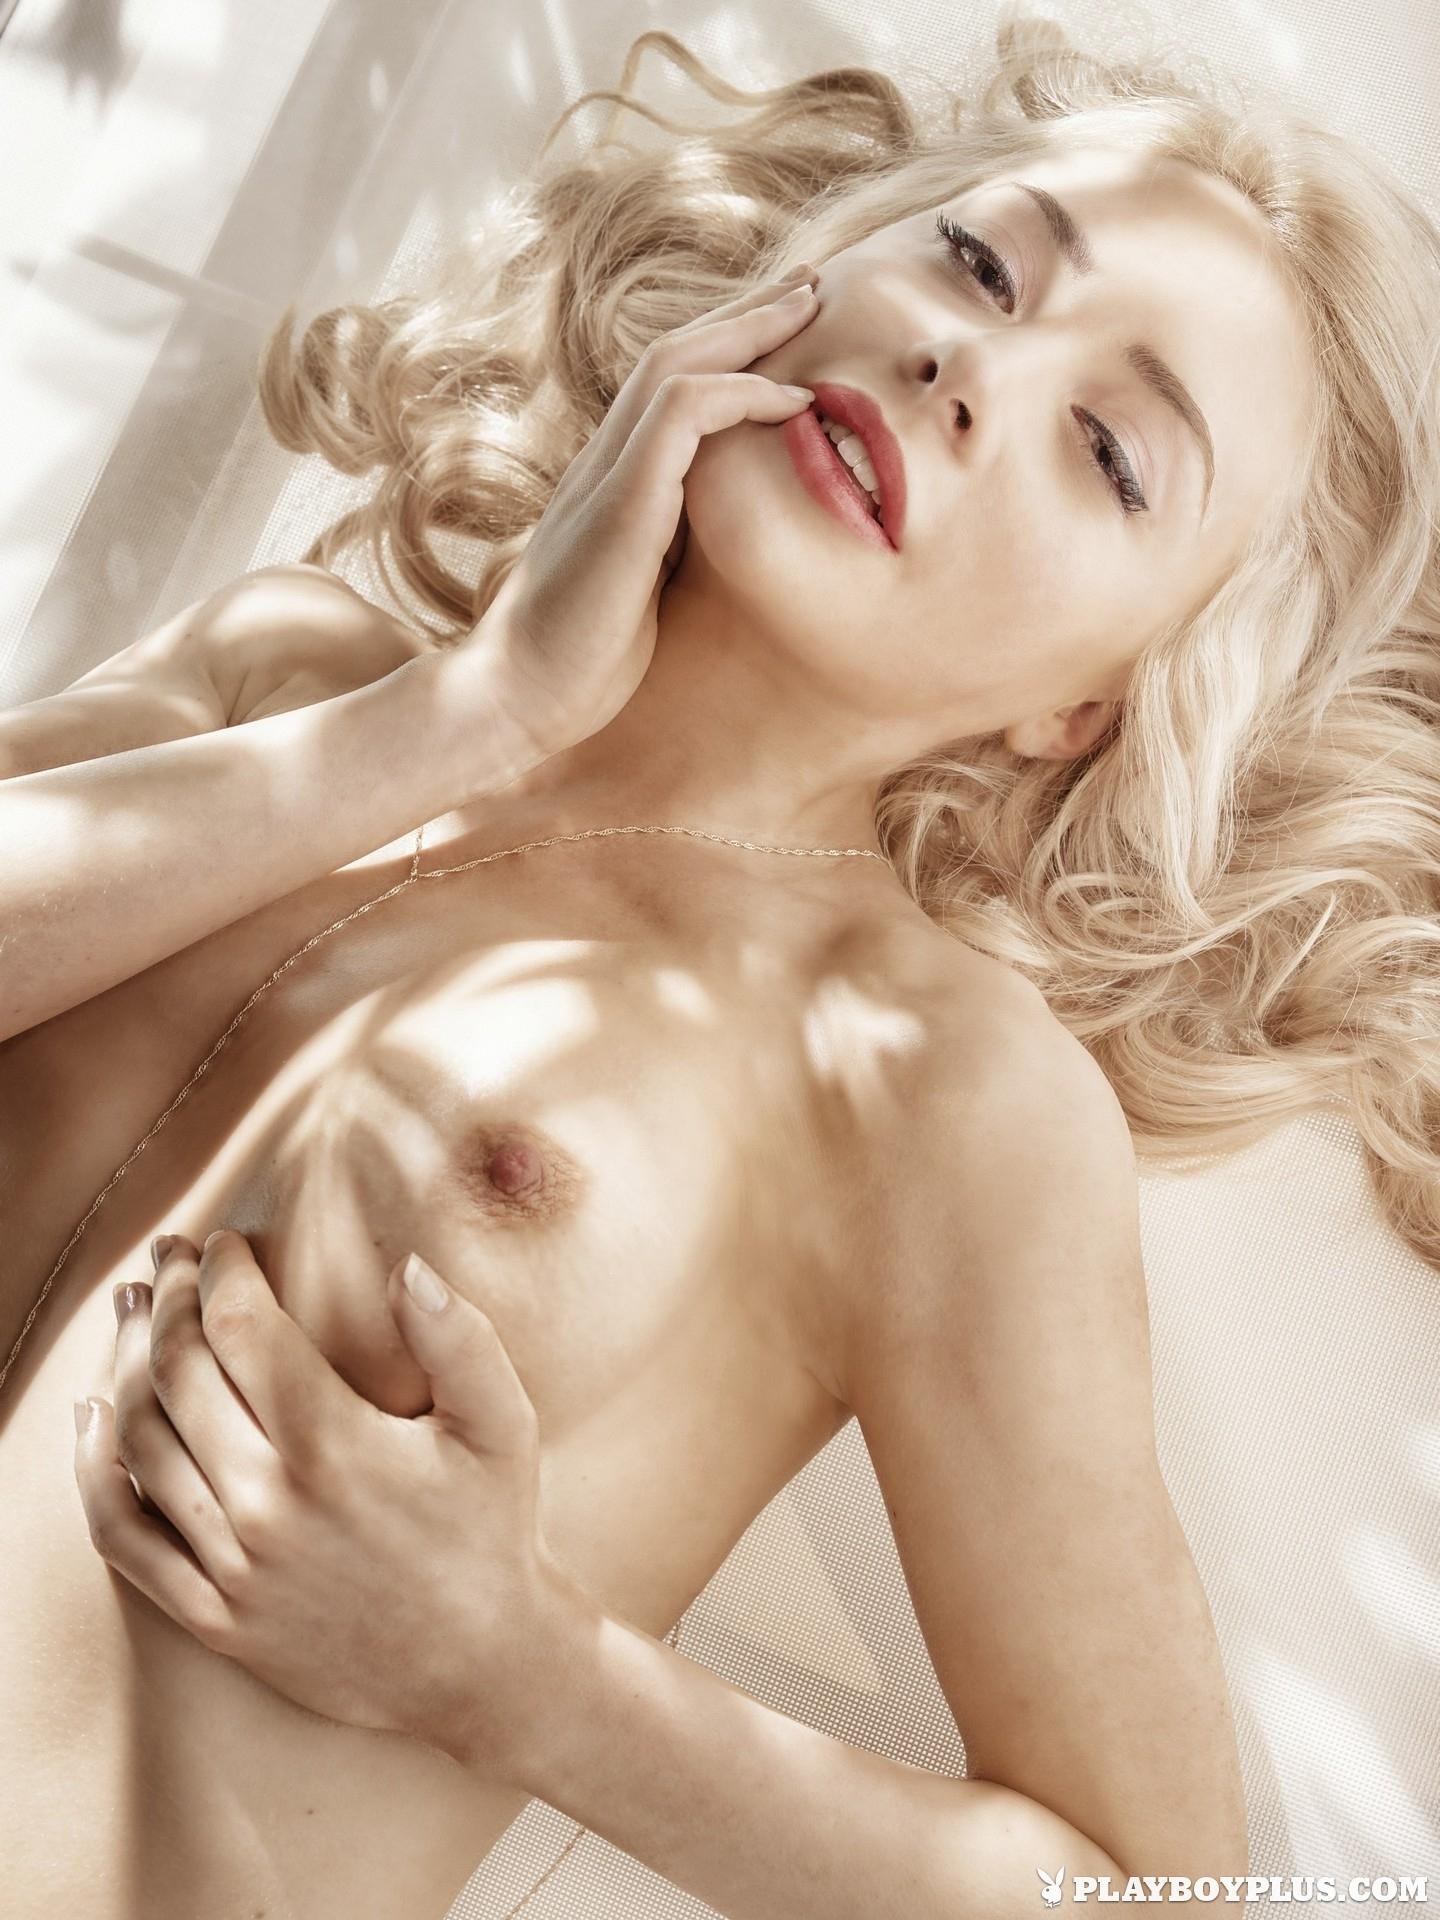 amber-bassick-blonde-nude-underwater-playboy-05